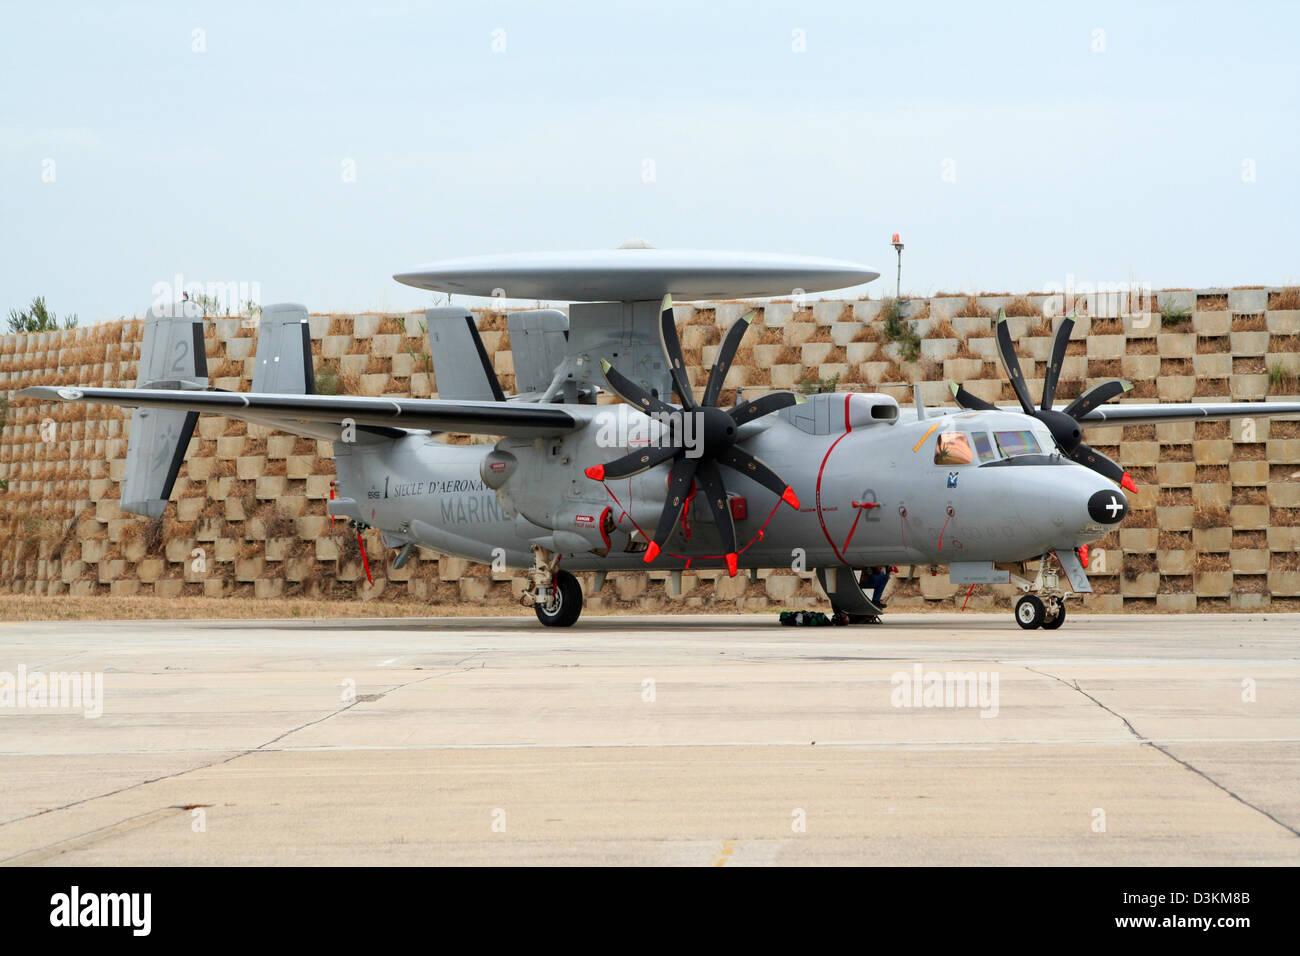 French Navy E-2 Hawkeye radar plane - Stock Image